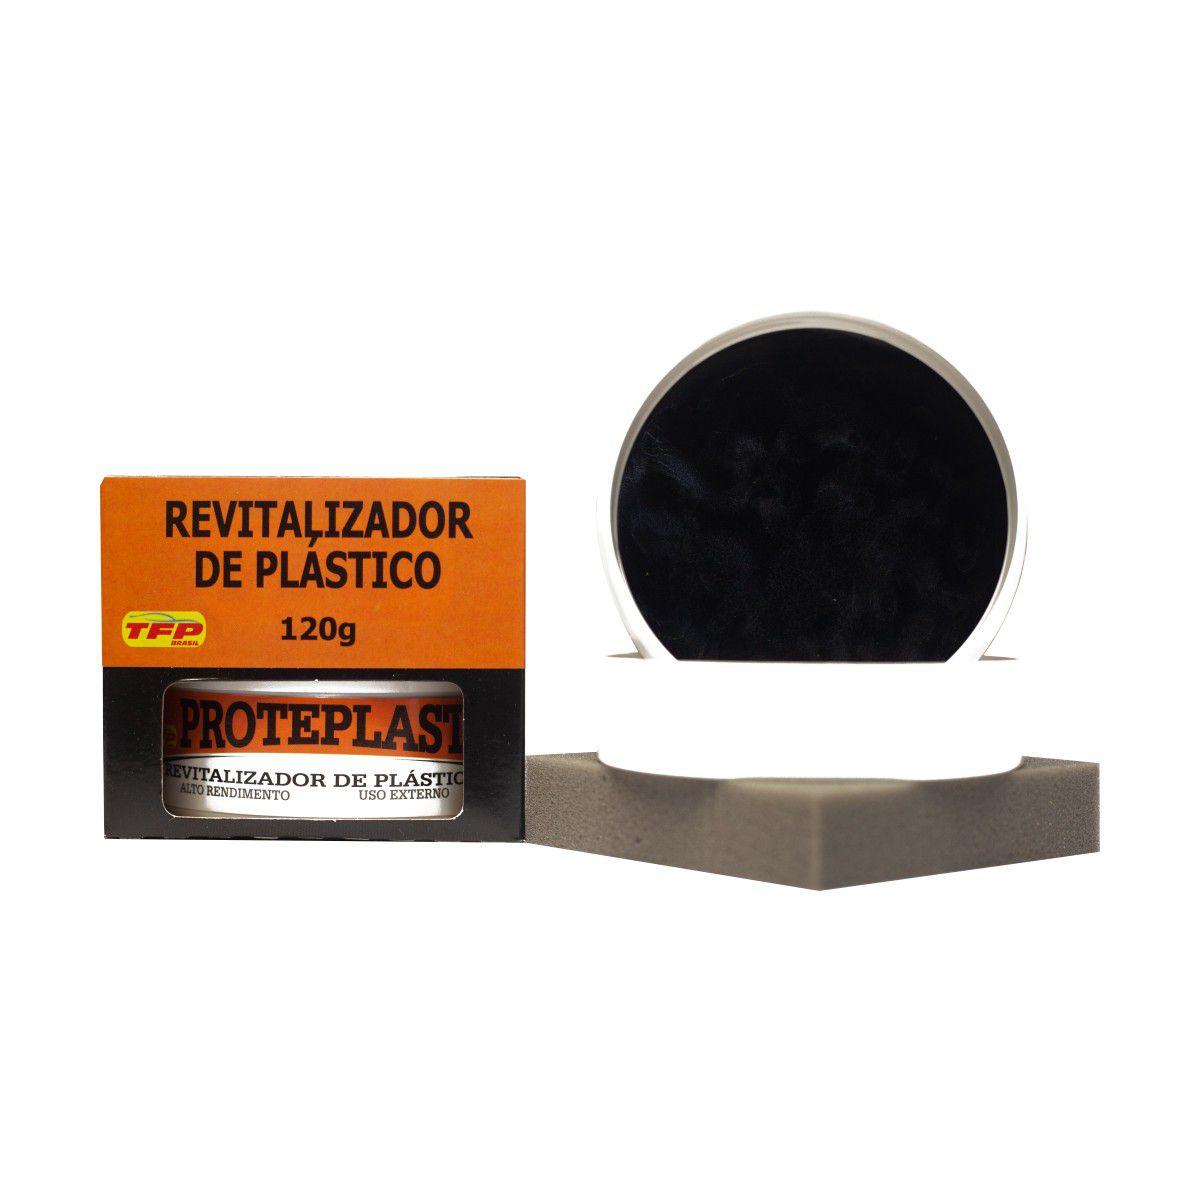 Revitalizador de plástico + Restaurador de Faróis